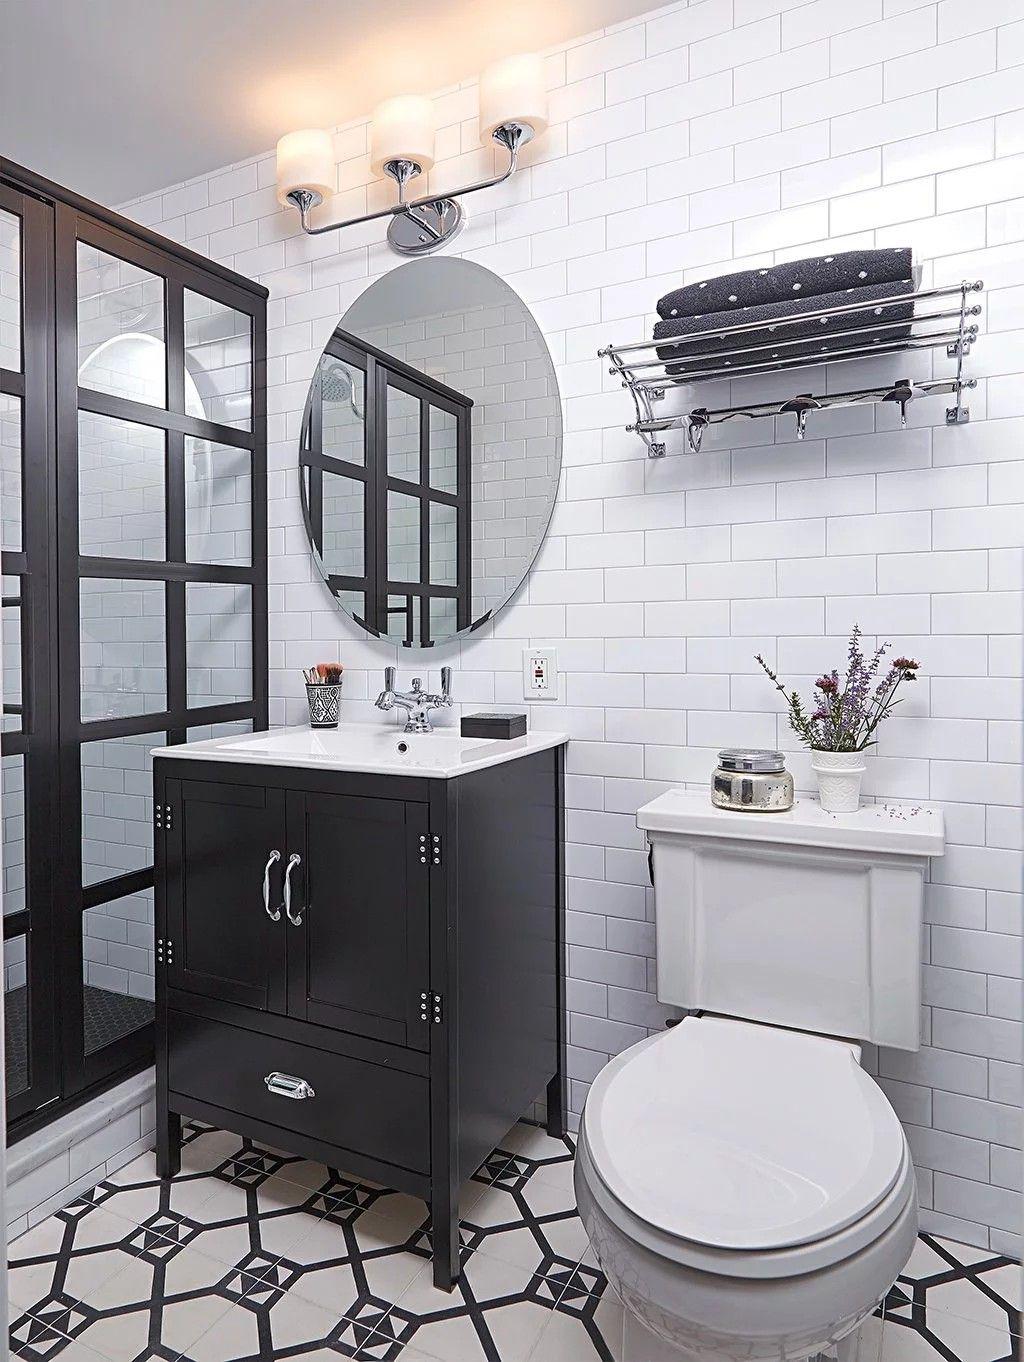 awesome bathrooms. These Awesome Bathrooms Will Make You Forget Boring, Basic White #GRIDSCAPE #SHOWERDESIGN #MASTERBATHROOMIDEAS #SHOWERDOOR #SHOWERDOORS #COASTALSHOWERDOORS 5